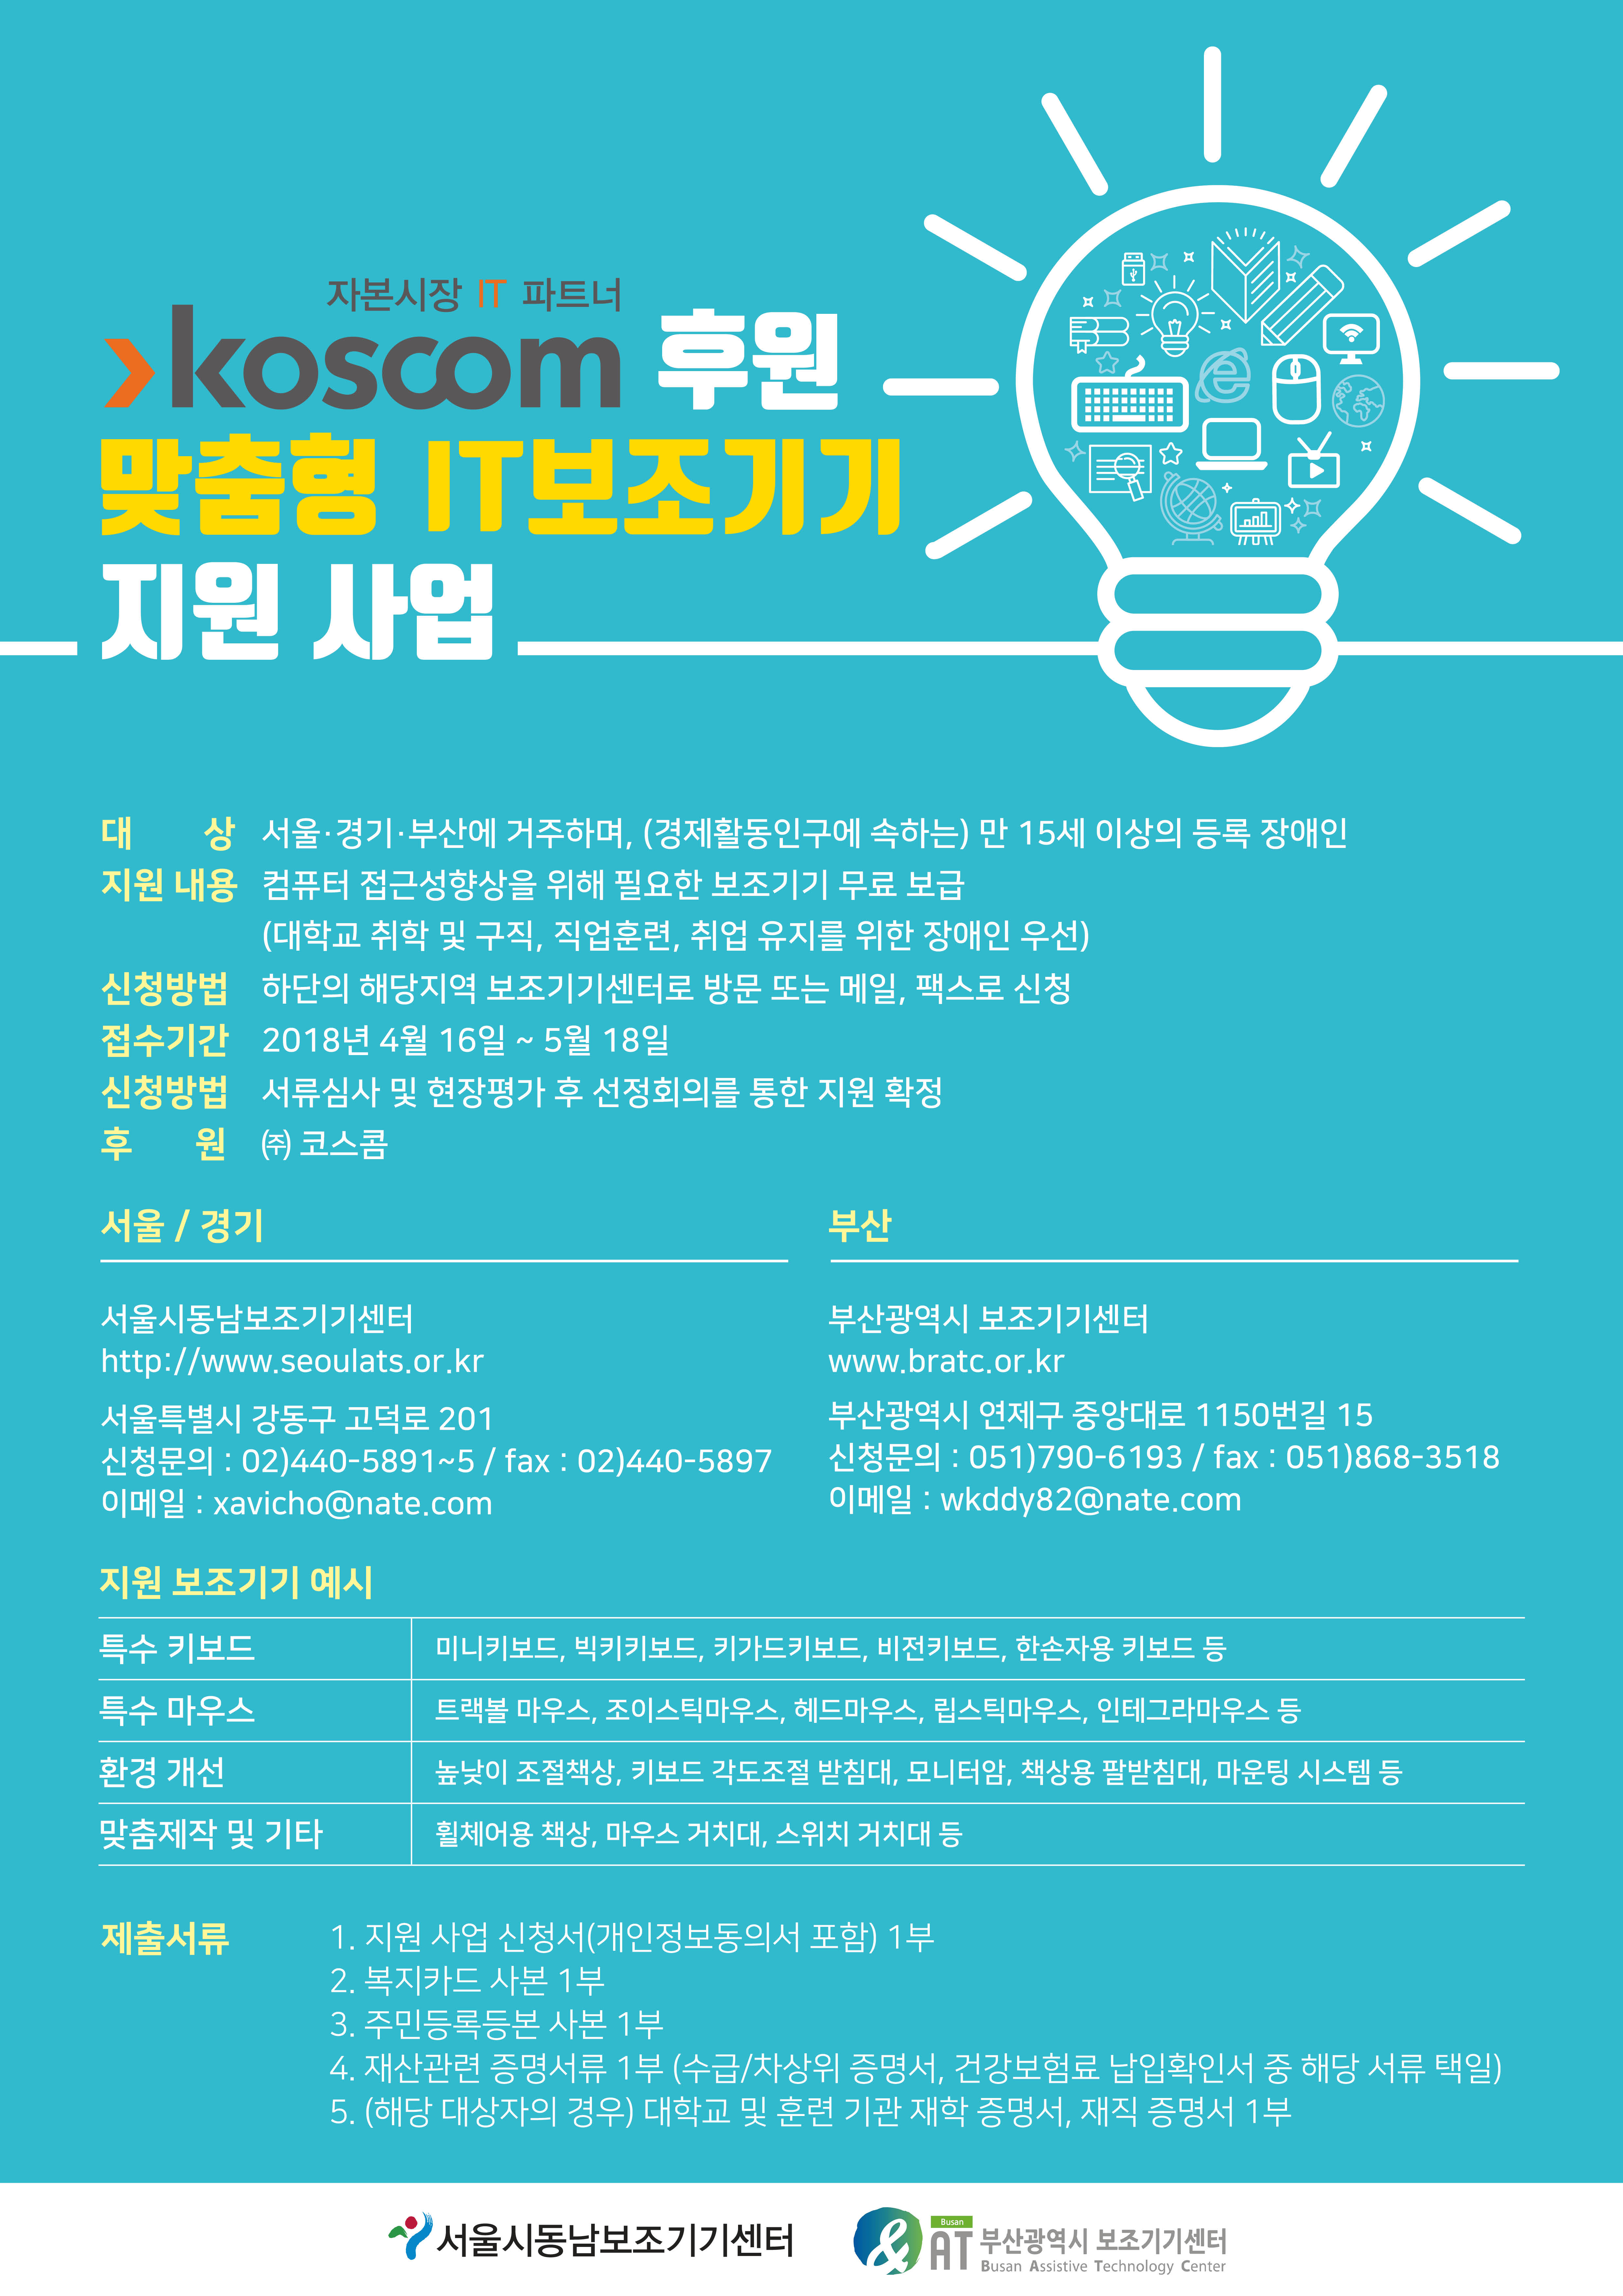 Koscom  후원 맞춤형 IT보조기기 지원사업 안내